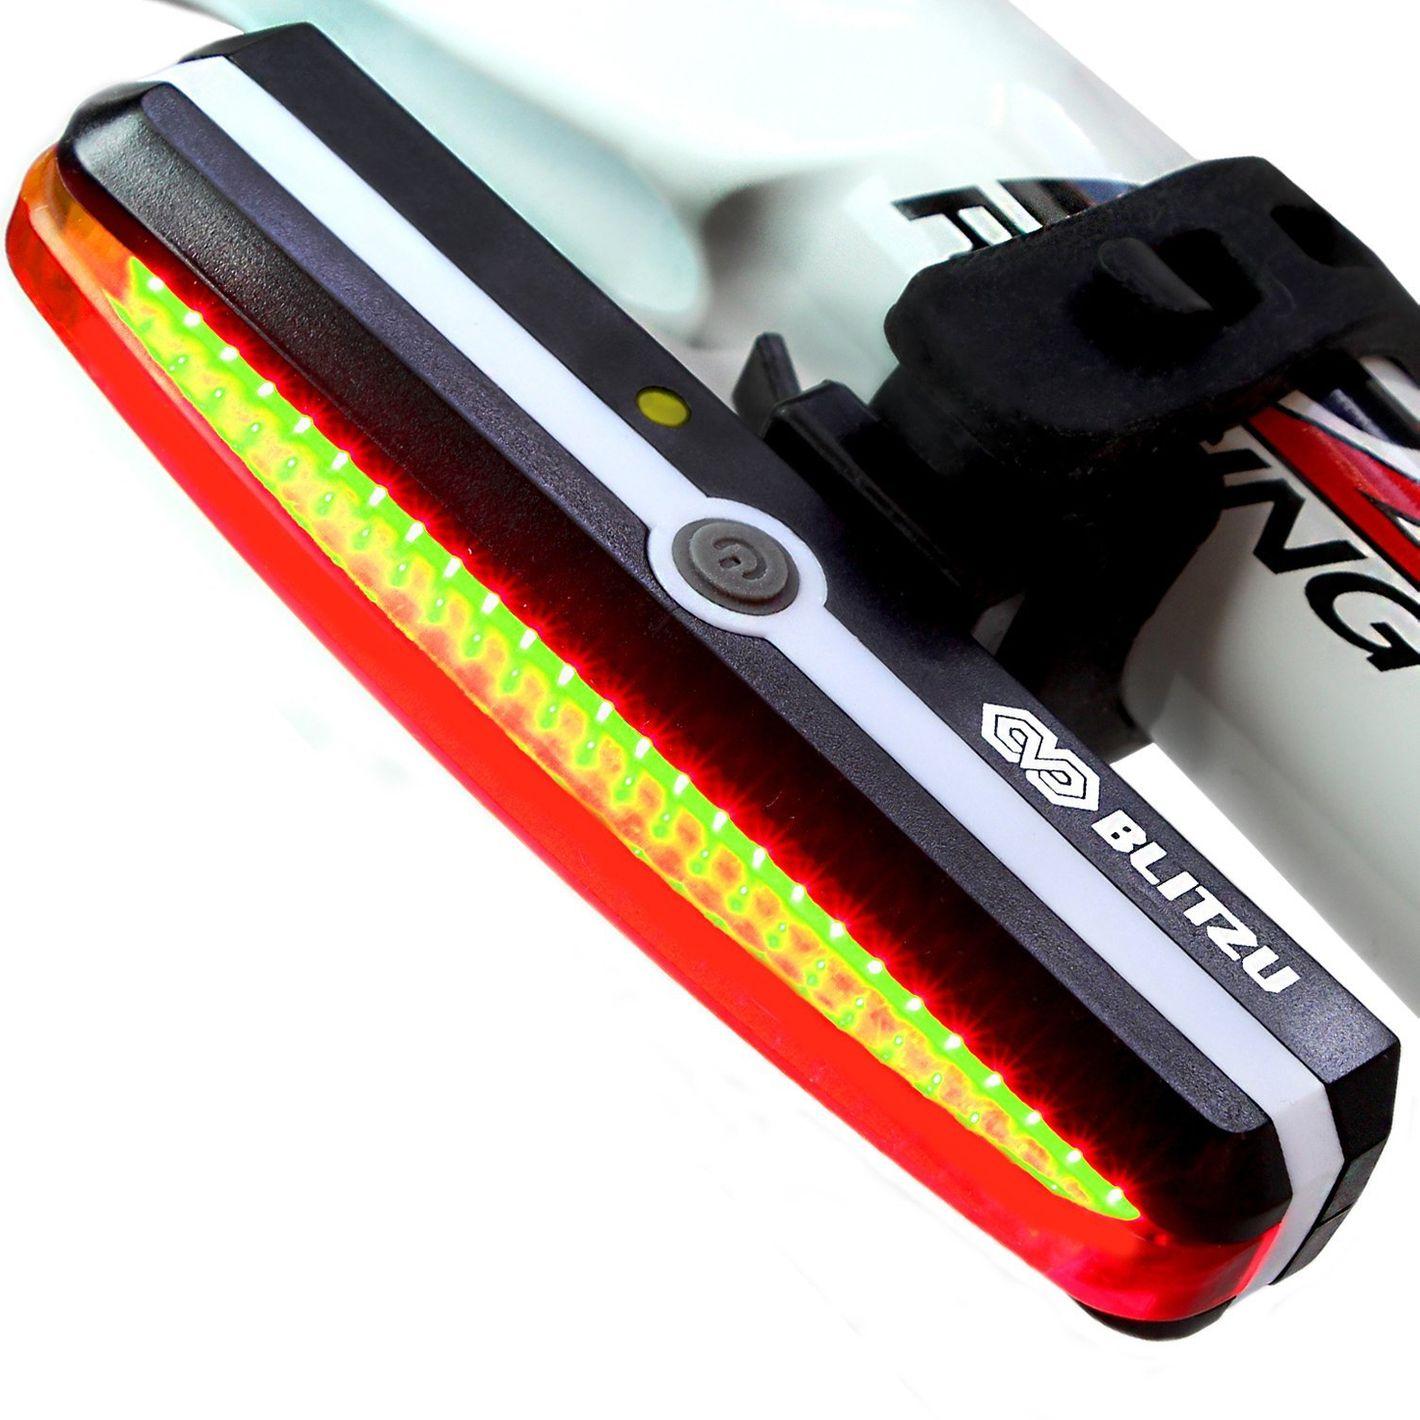 AAA Bicycle Light Lightweight Waterproof Bike Light Front Rear Tail Light Lamp